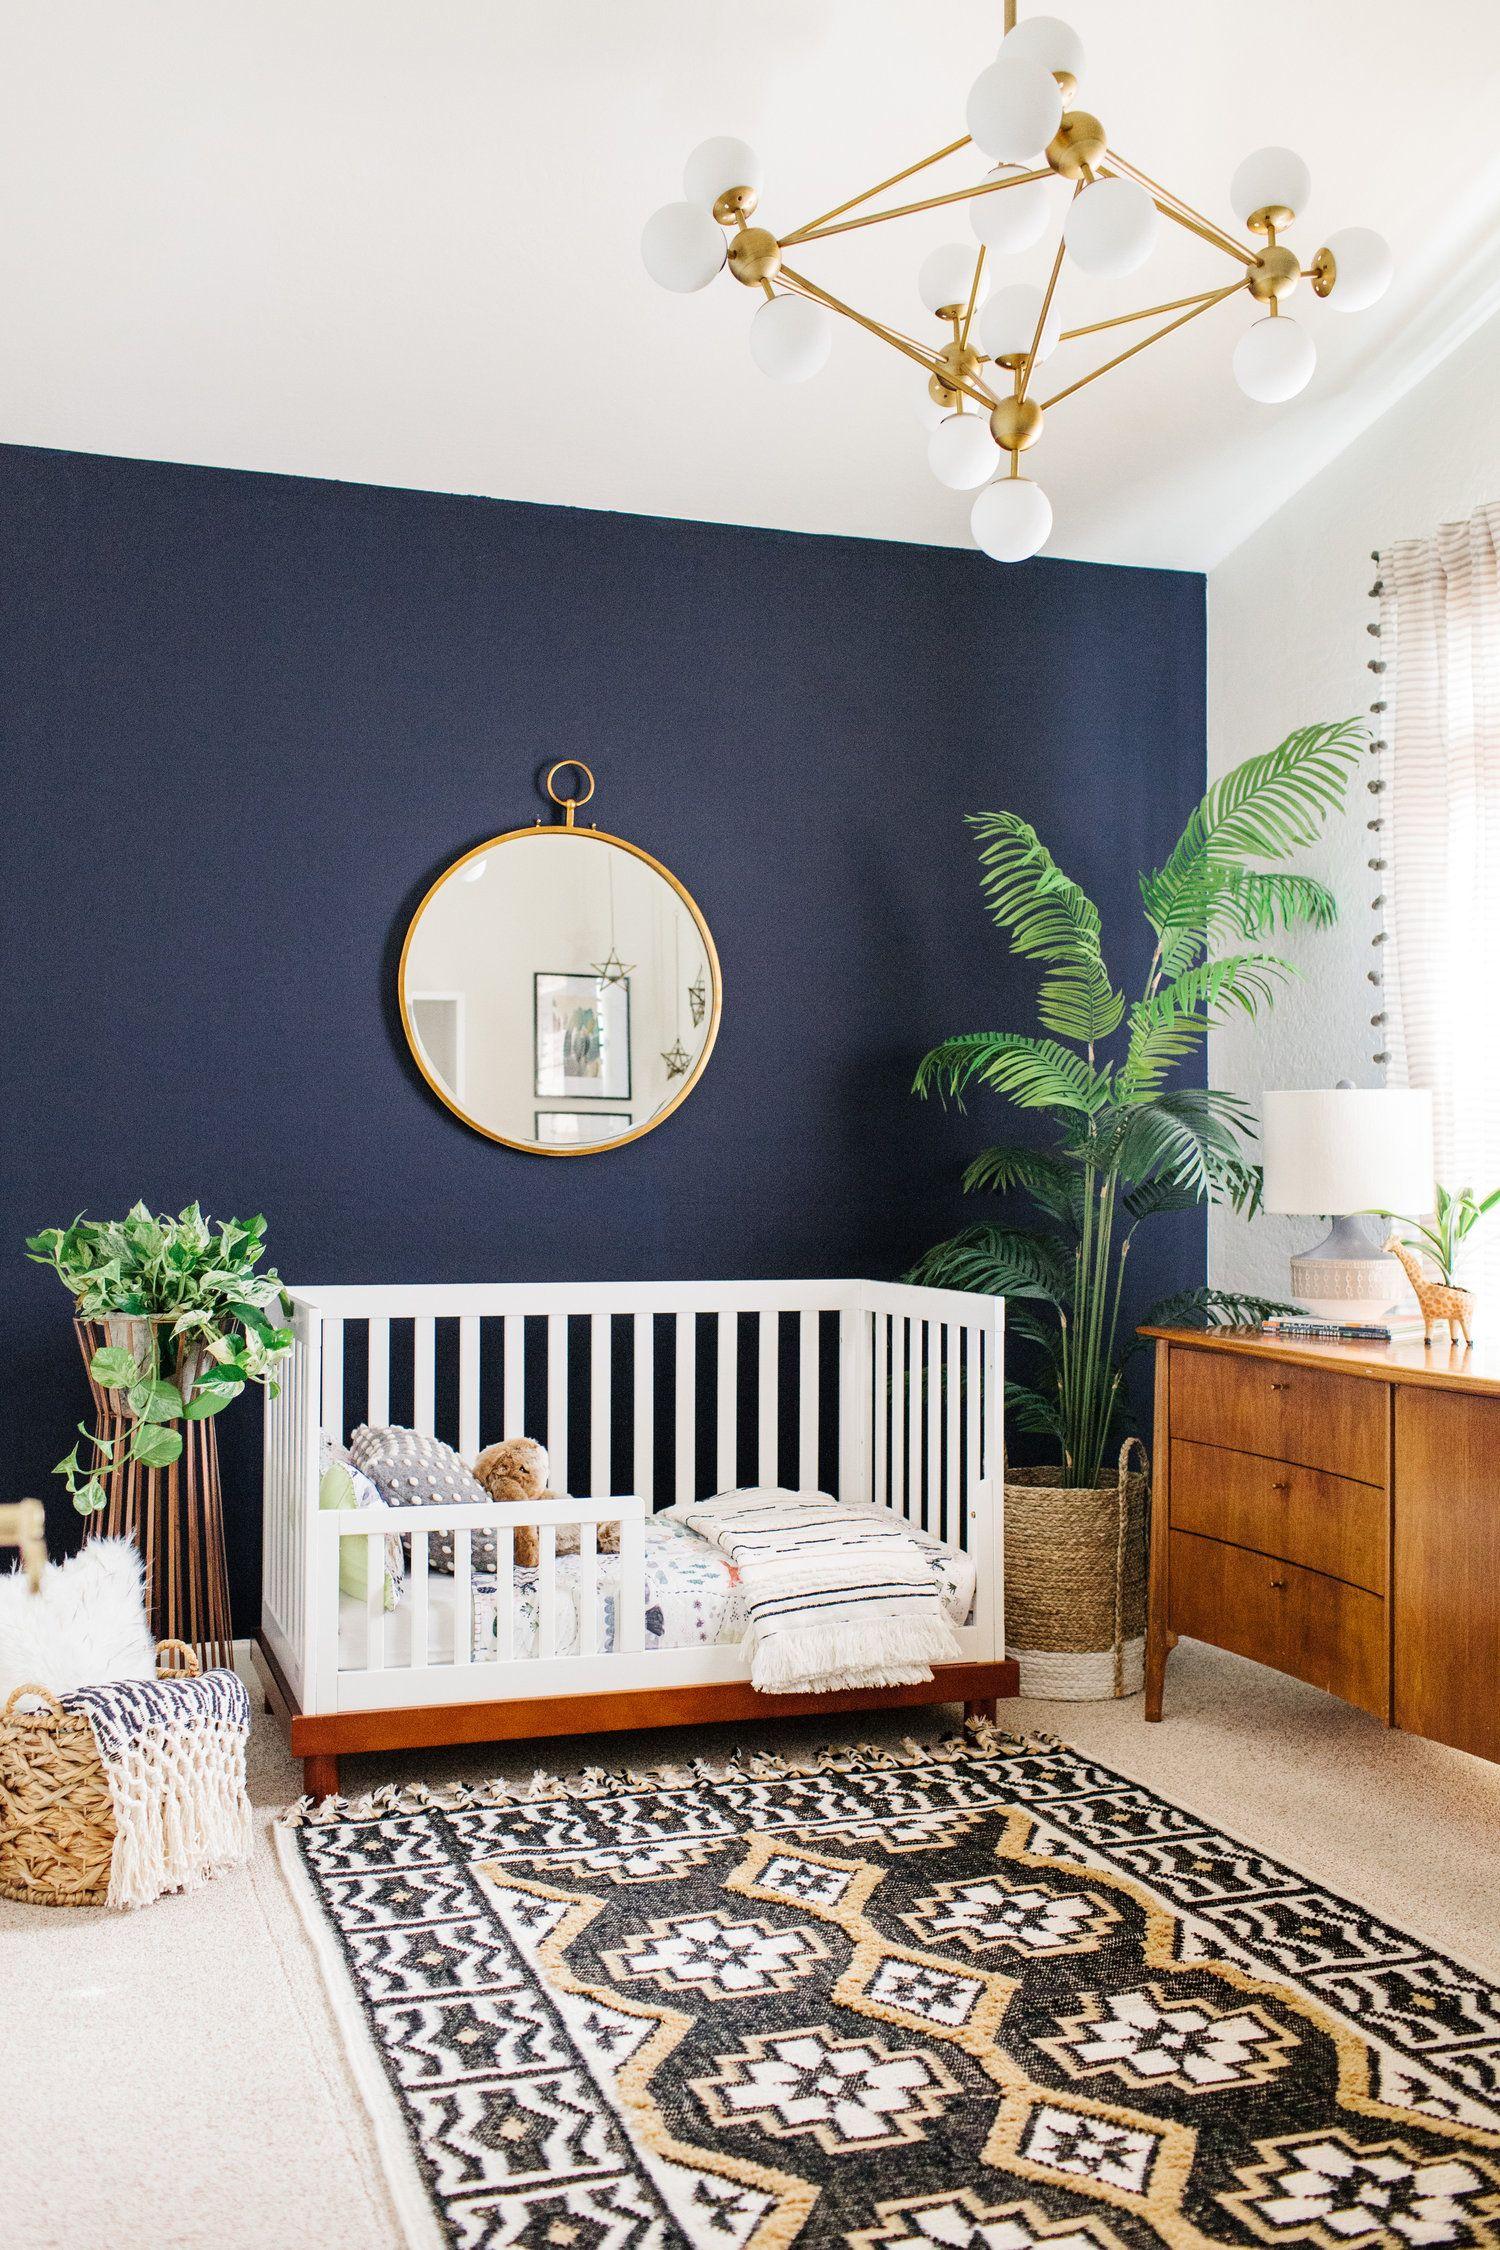 Levi S Nursery Update Ave Styles Kids Room Design Baby Room